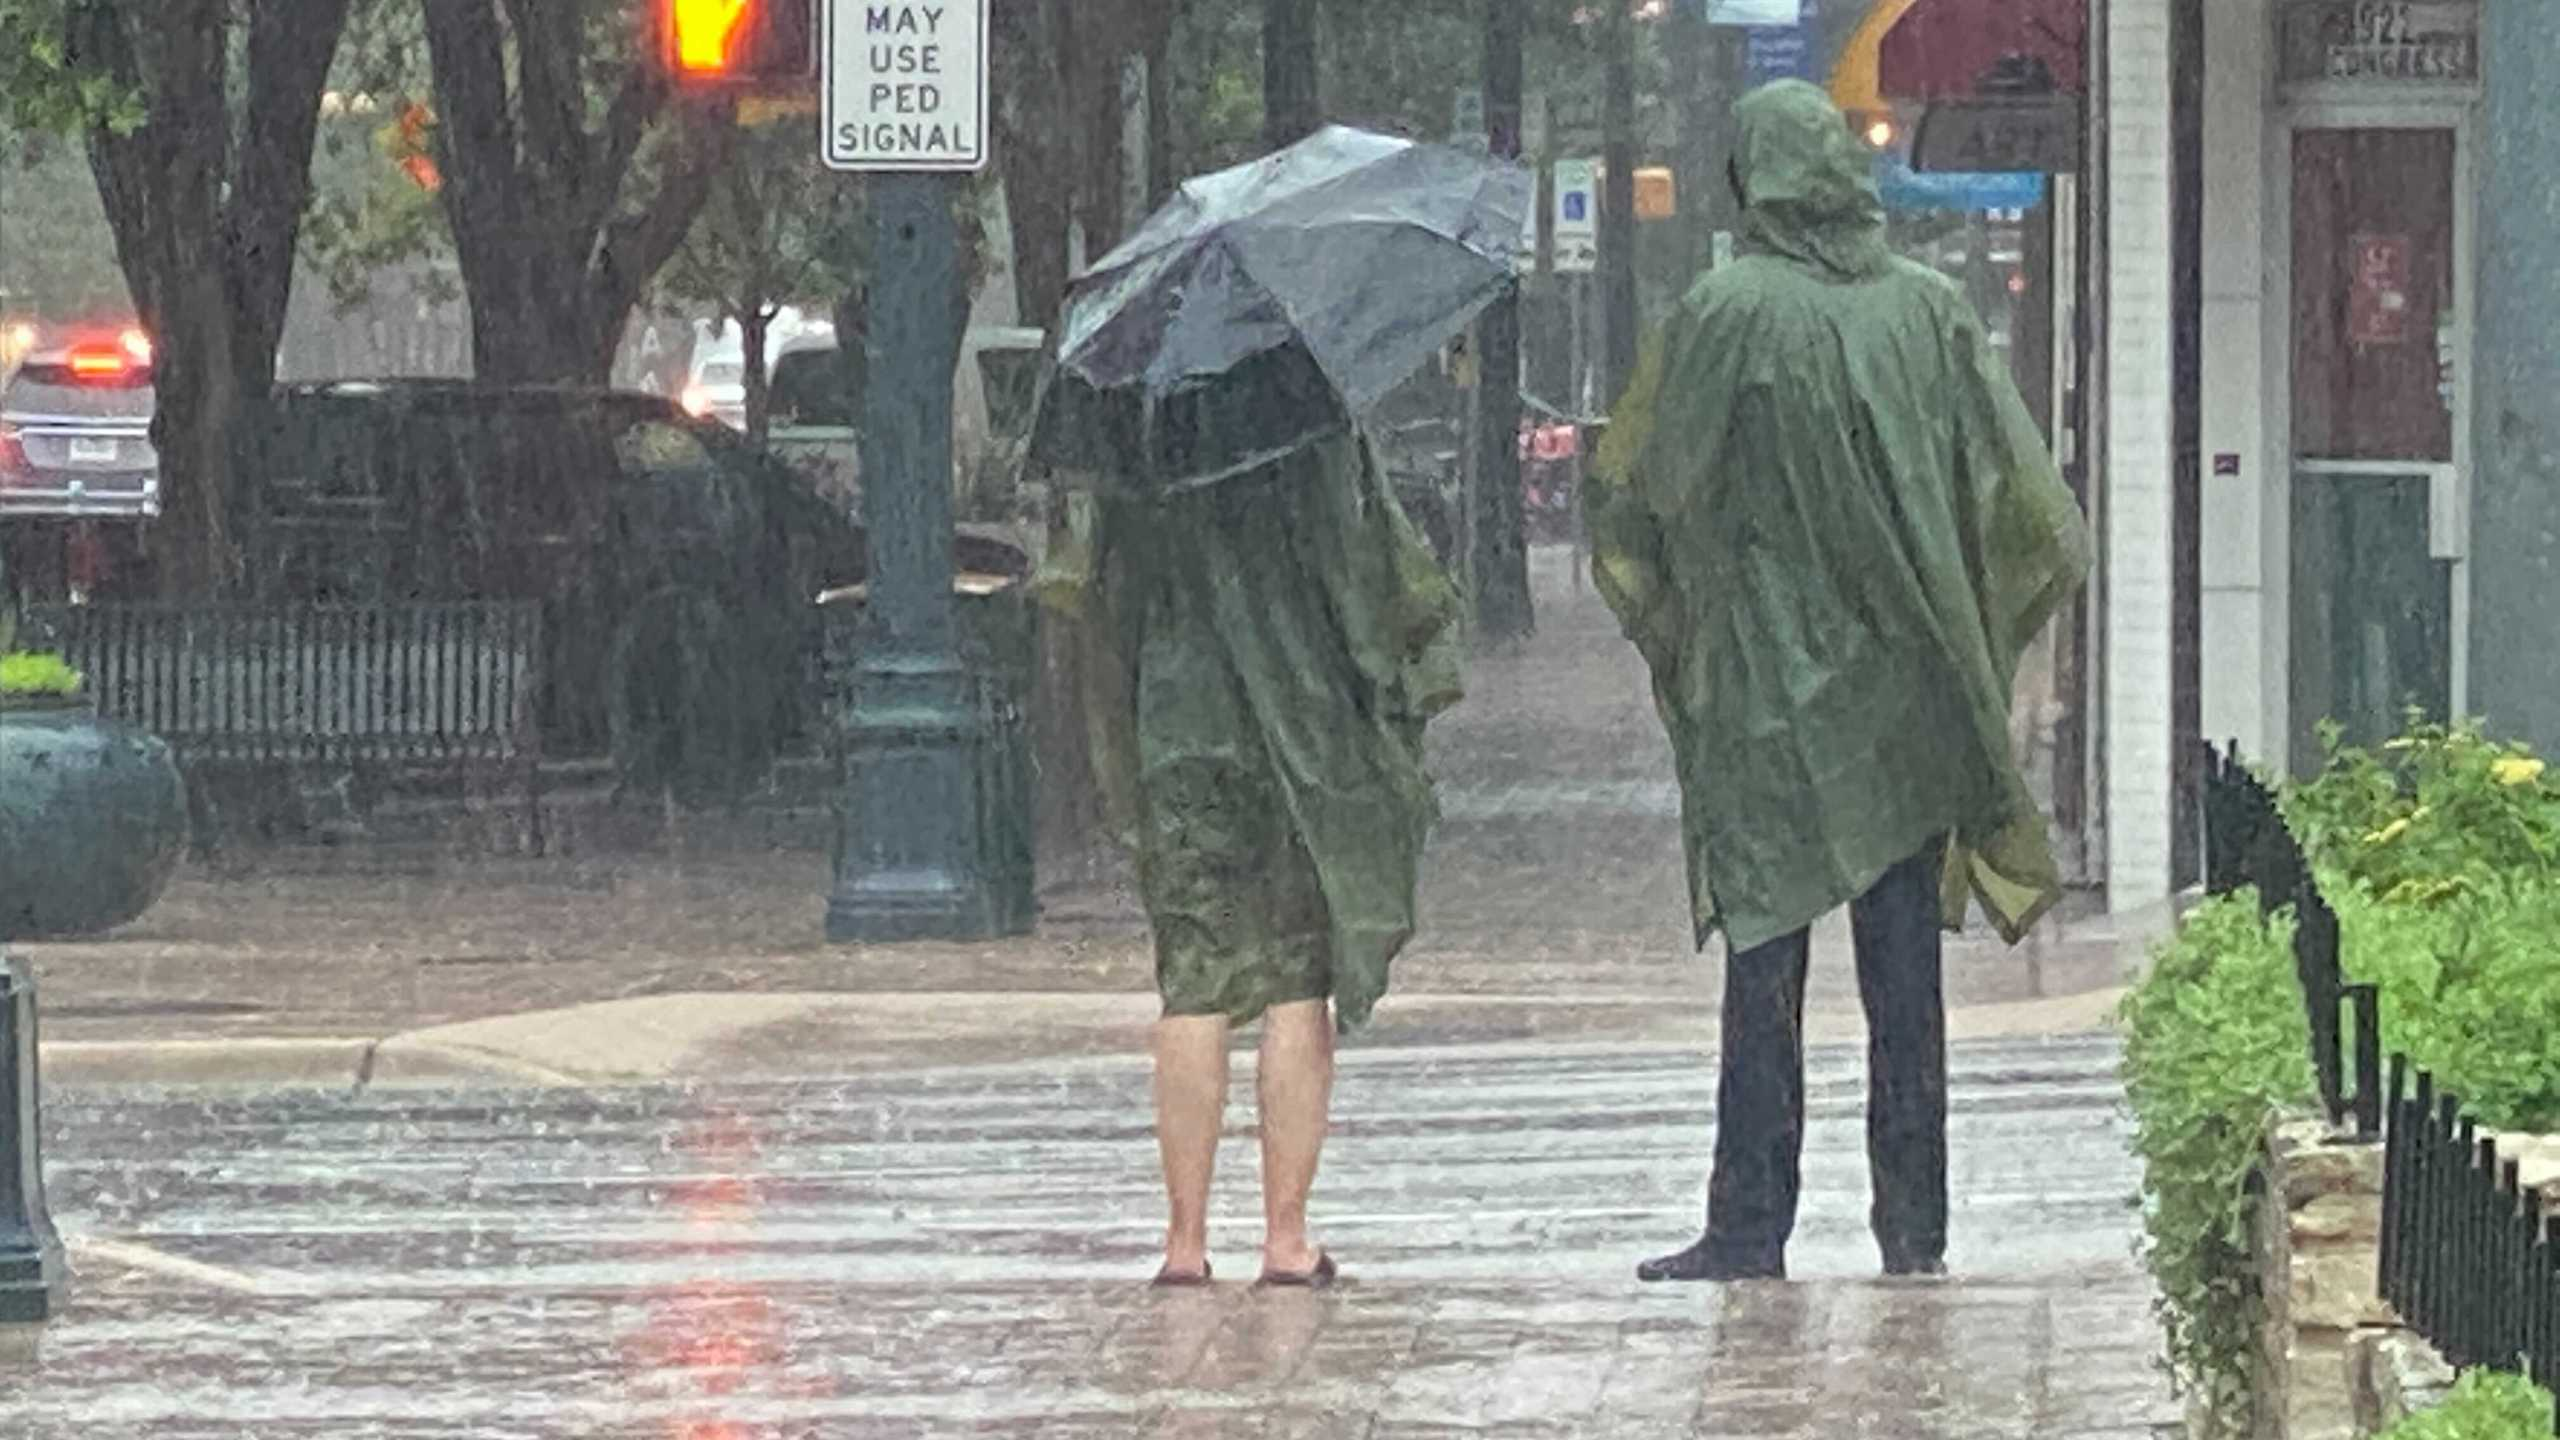 Rainy day in Downtown Austin